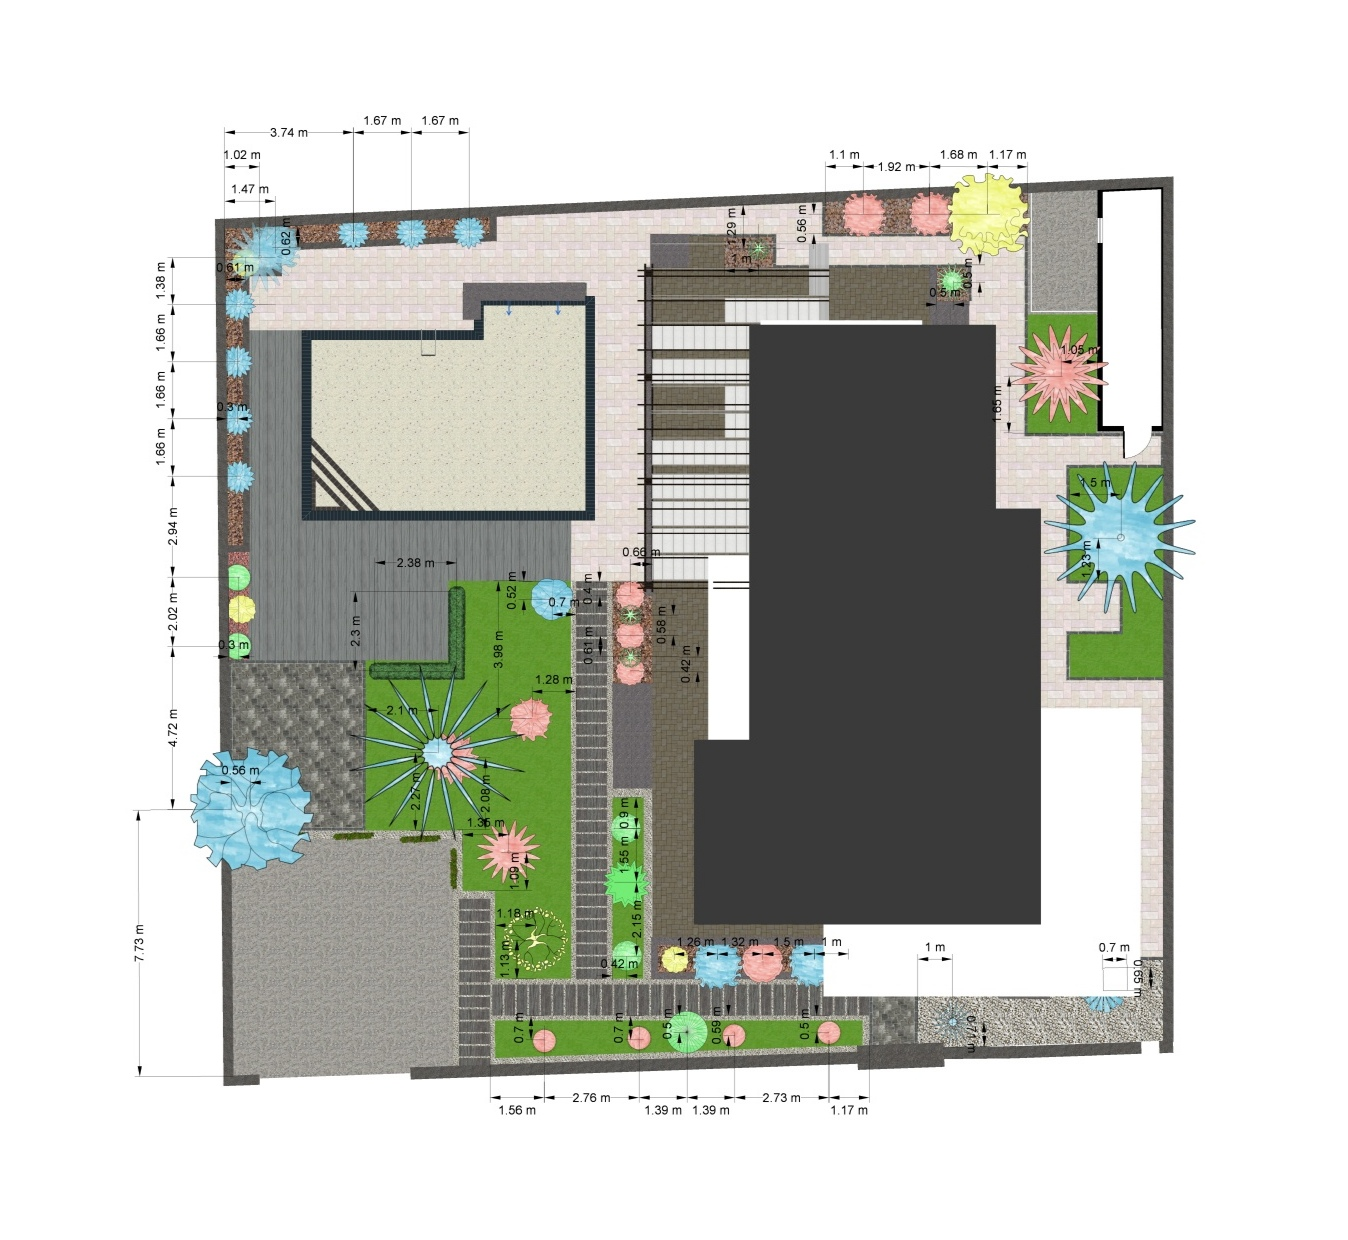 poza proiect gradina plan 2d